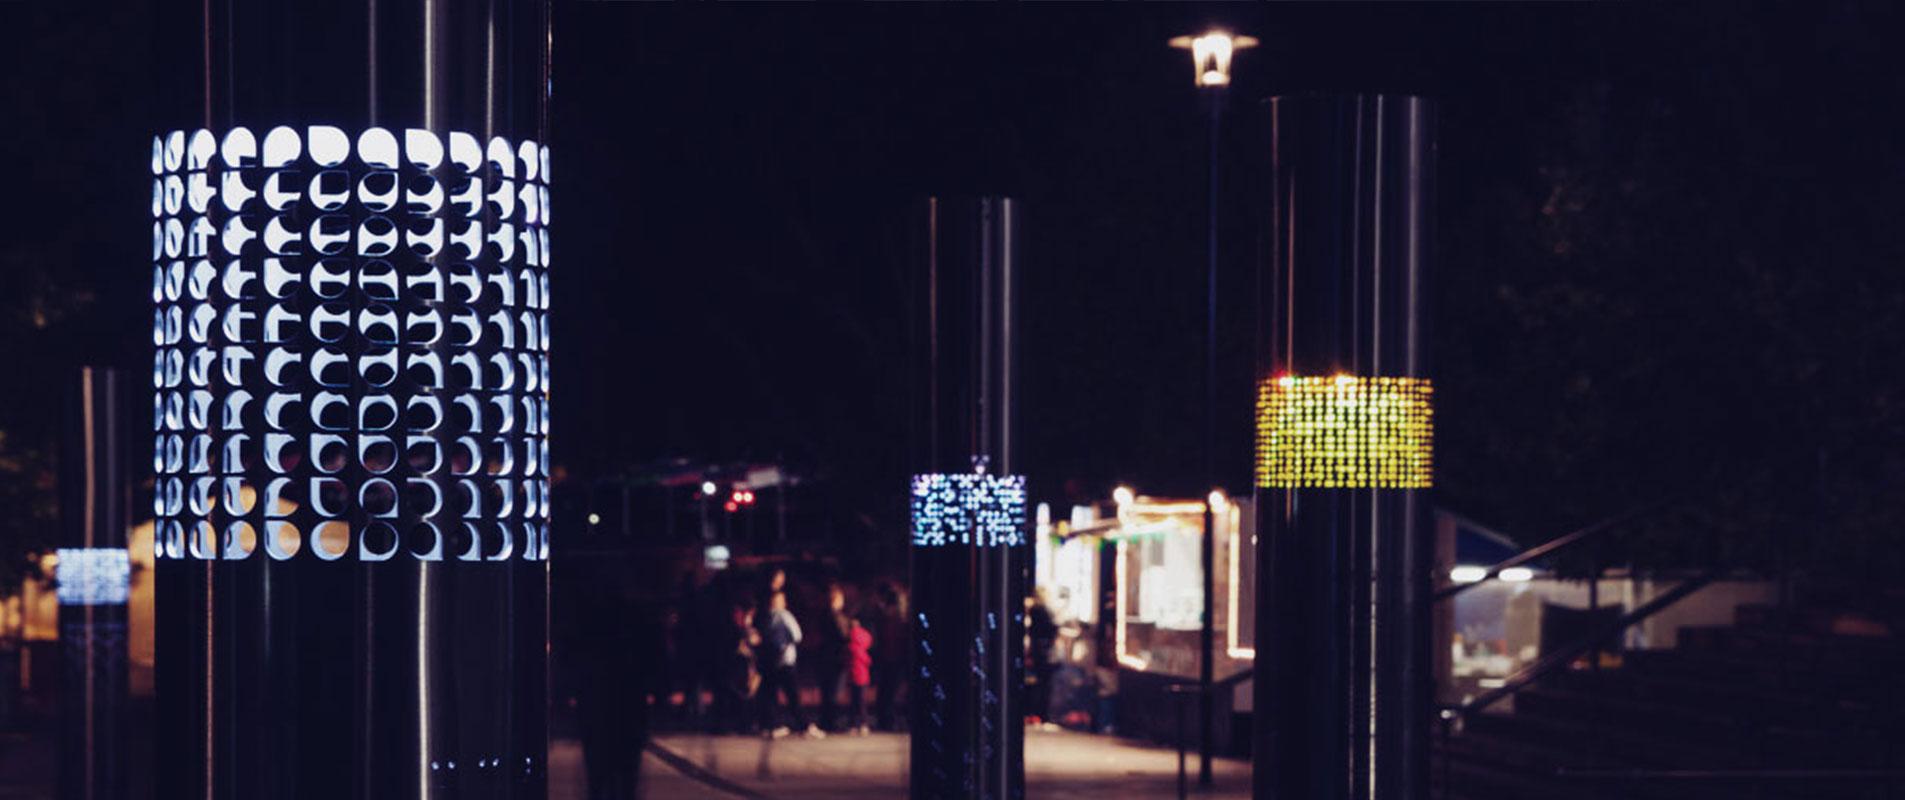 Nkrypt-wonderment-walk